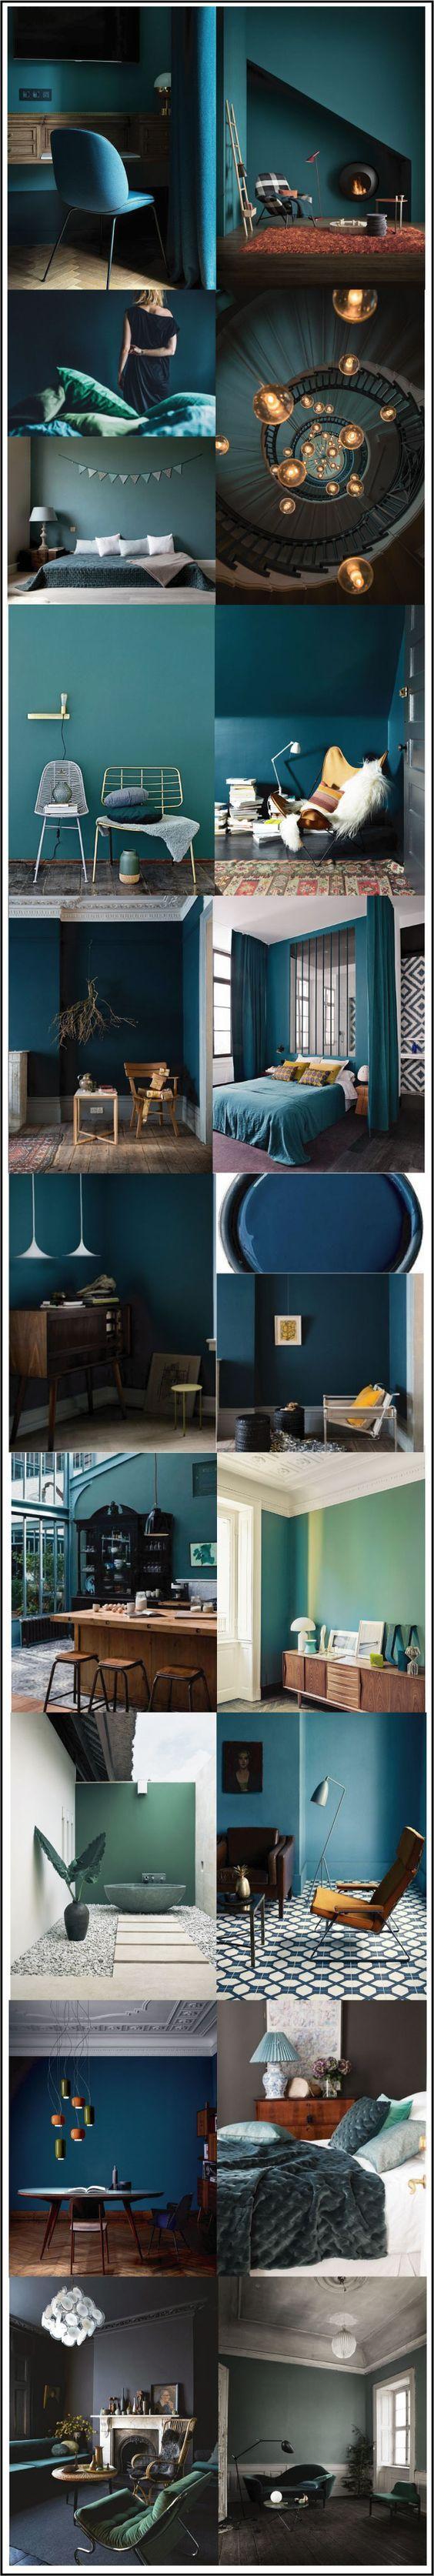 bleu paon-vert balsam-bleu canard- mood board chiara-stella-home